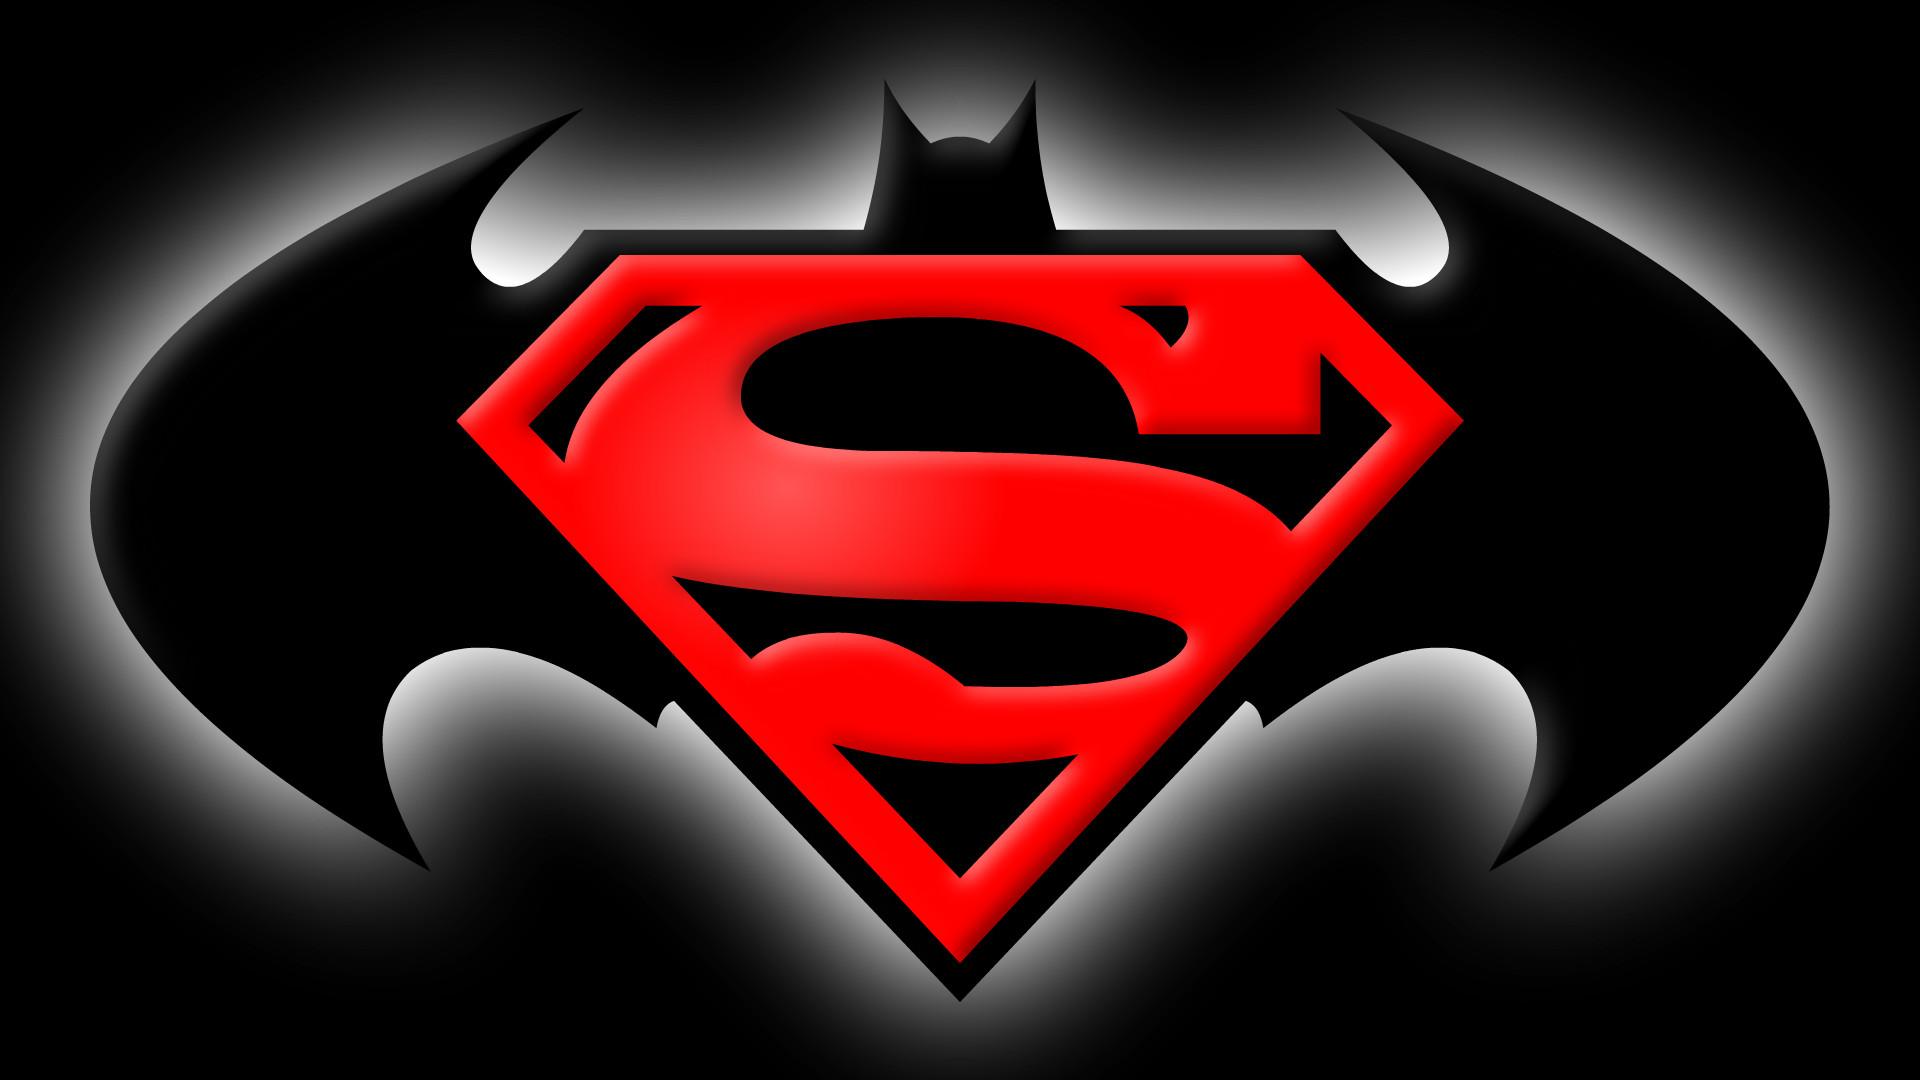 Superman/Batman Symbol by Yurtigo on Clipart library